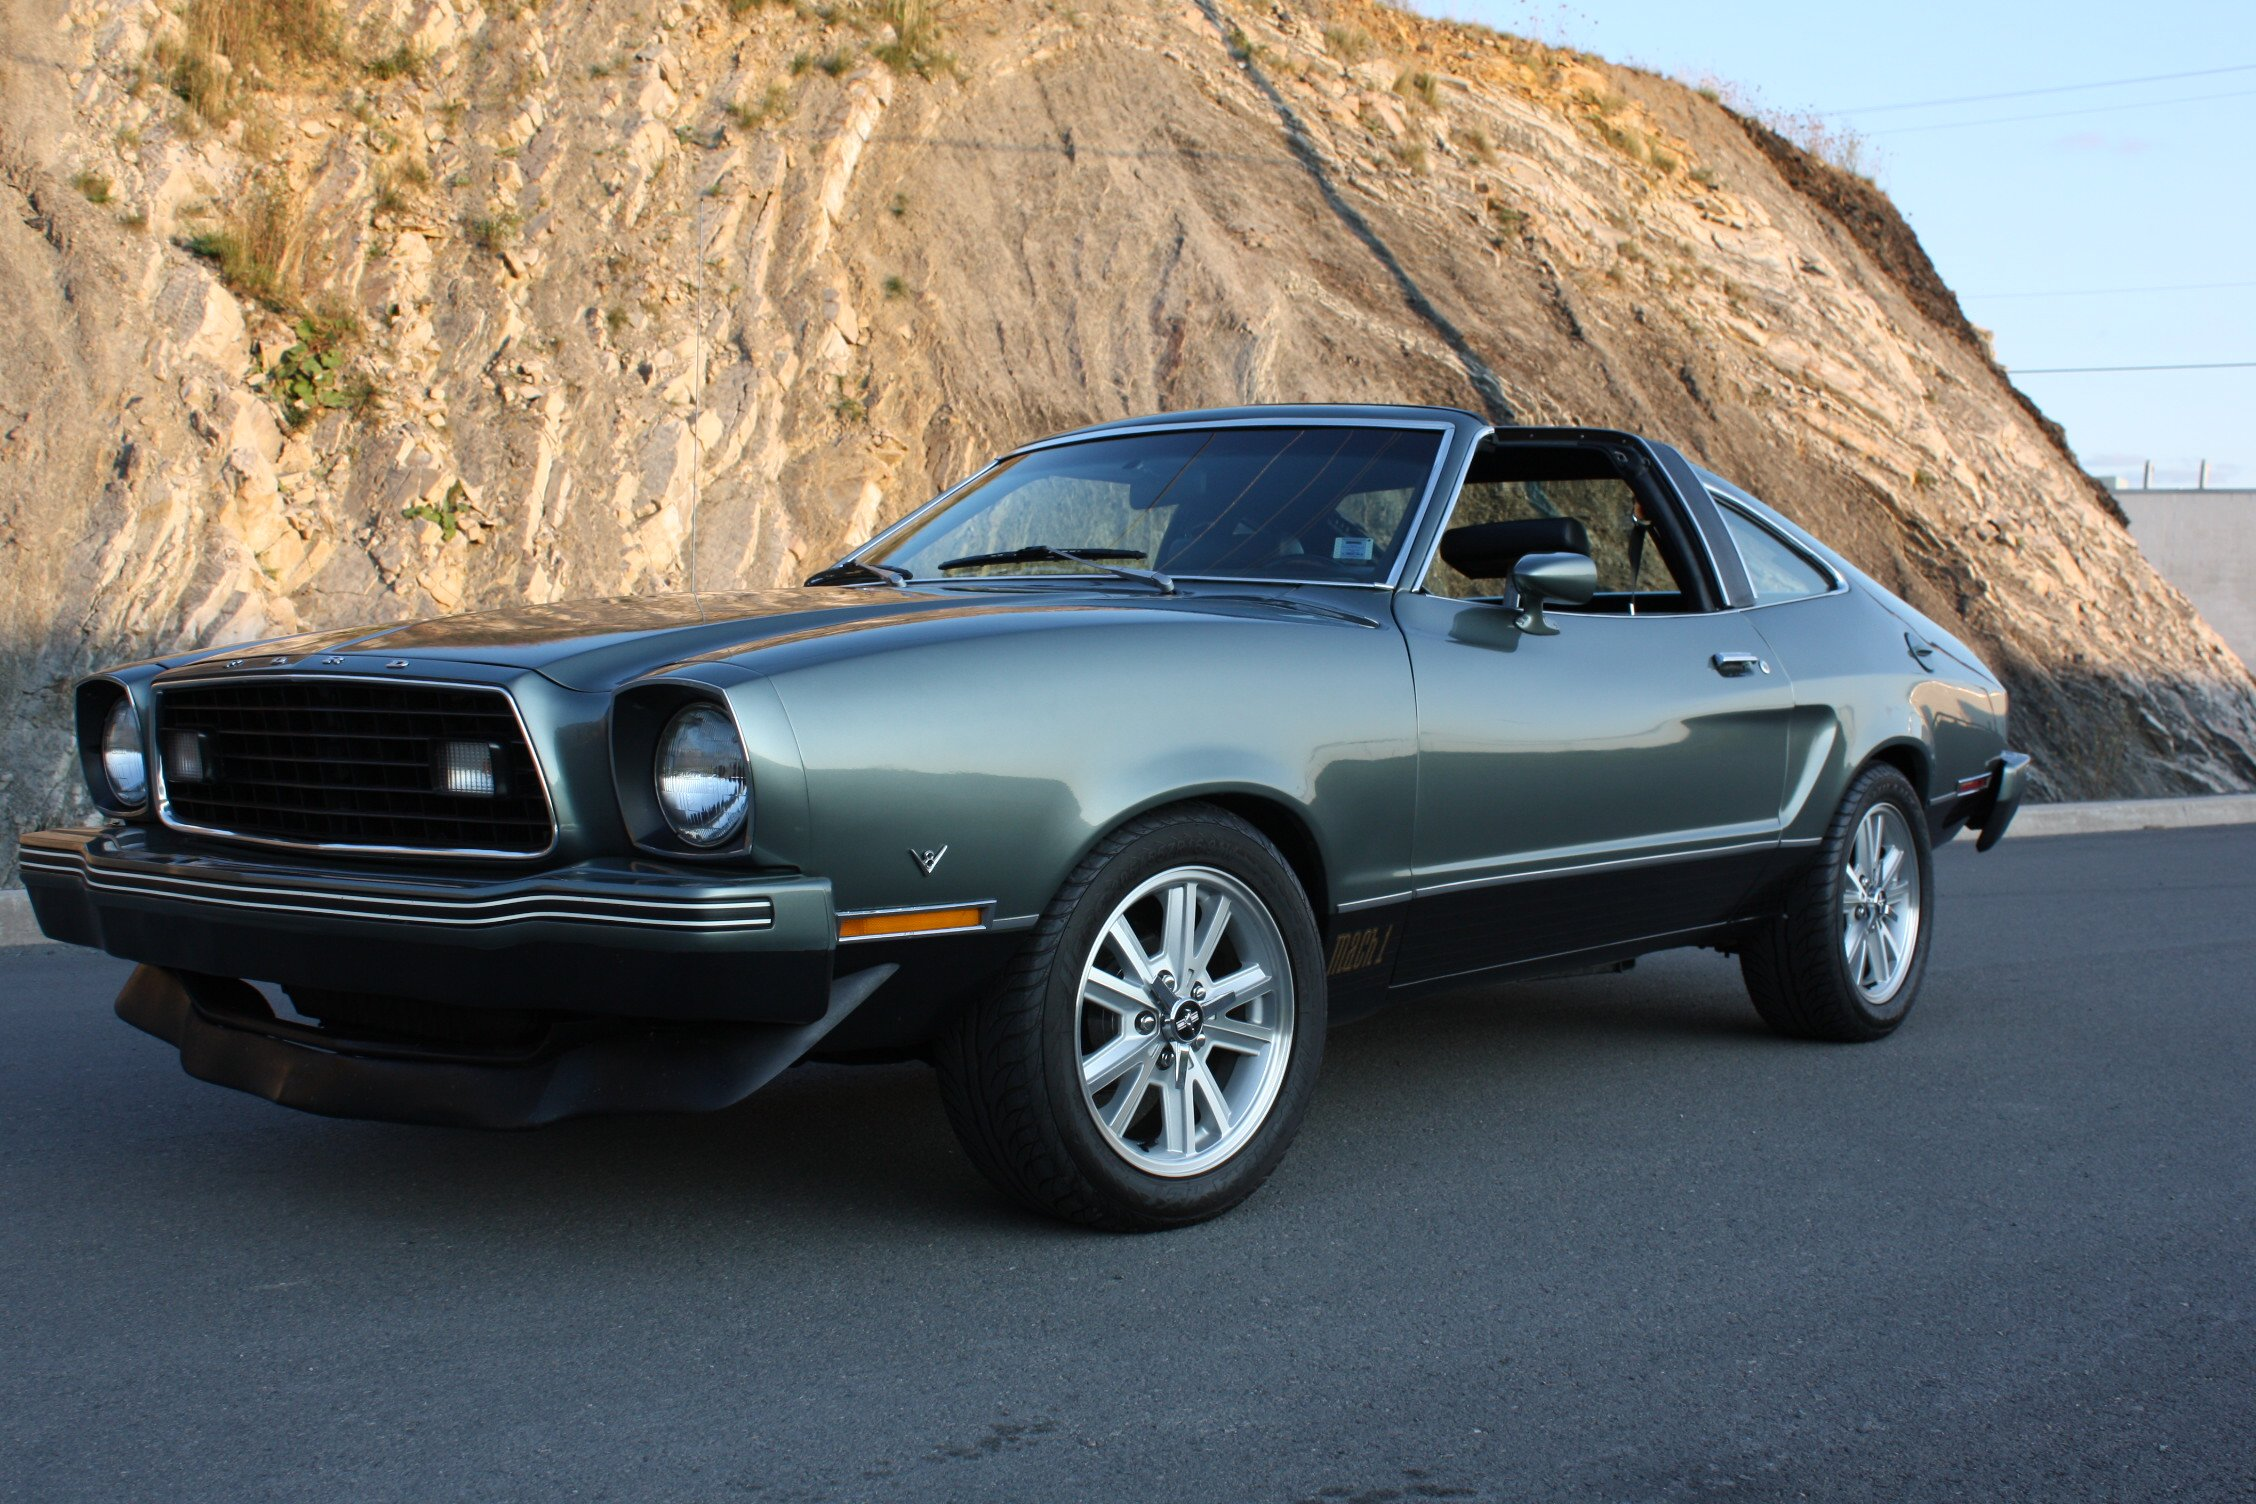 Ford Mustang Gt Jalopnik